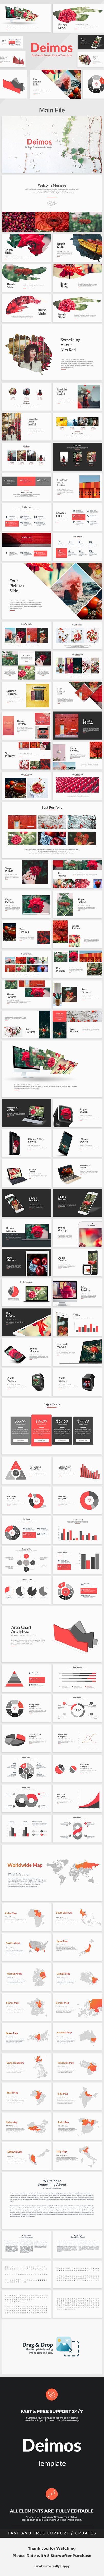 Deimos - Business Google Slide Template. Download:https://graphicriver.net/item/deimos-business-google-slide-template/19247856?ref=thanhdesign